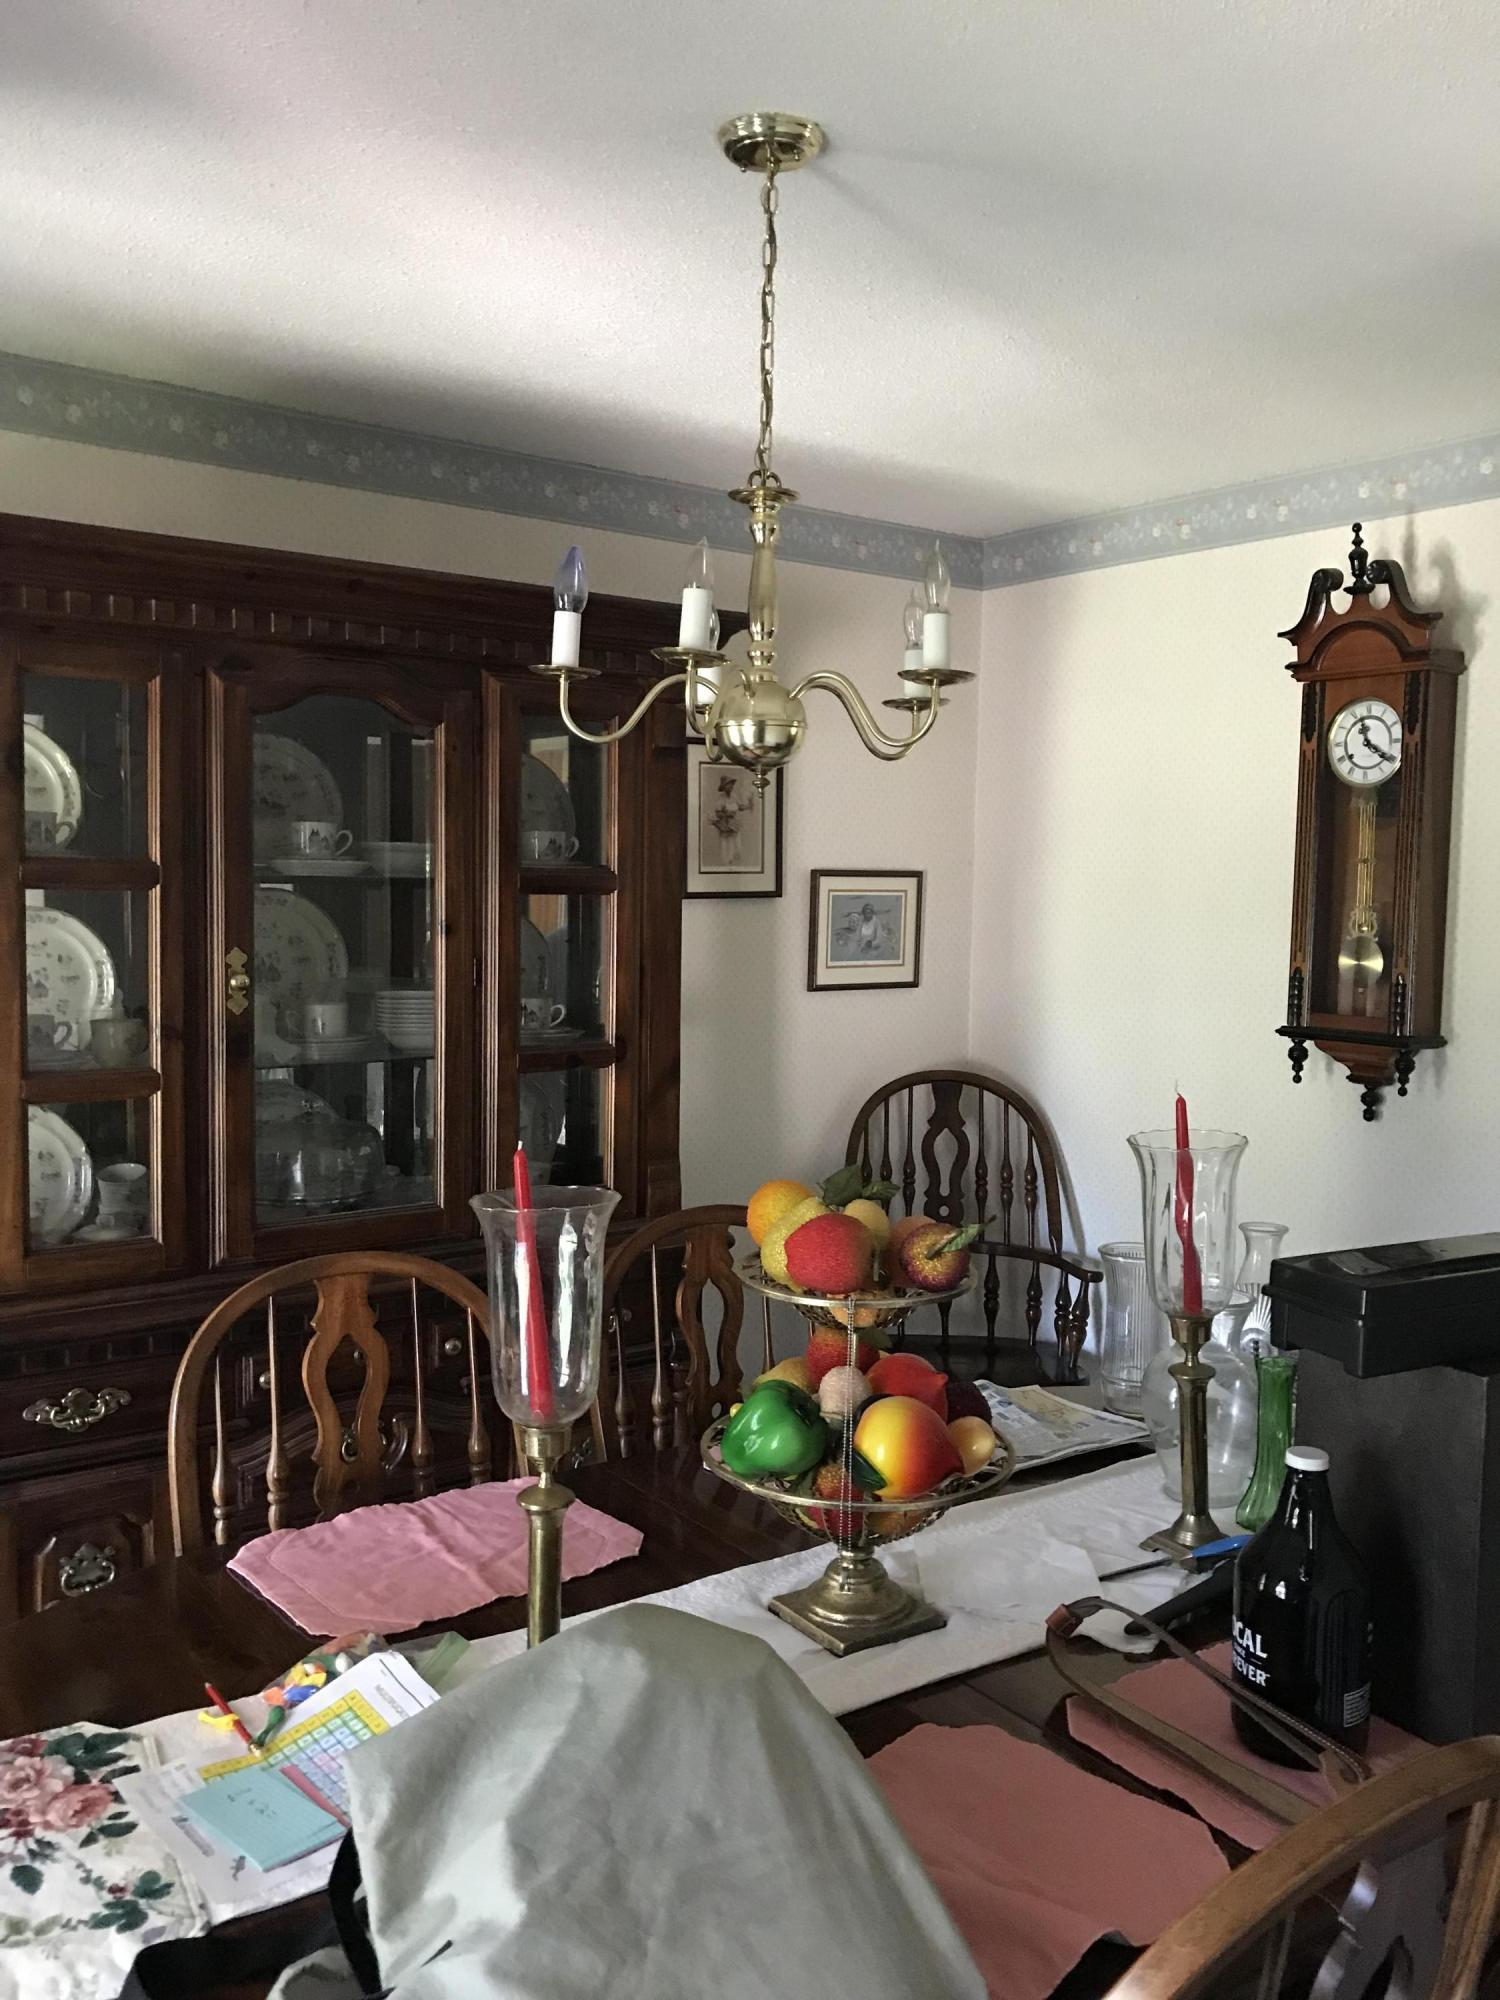 Harborgate Shores Homes For Sale - 1123 Island View, Mount Pleasant, SC - 6